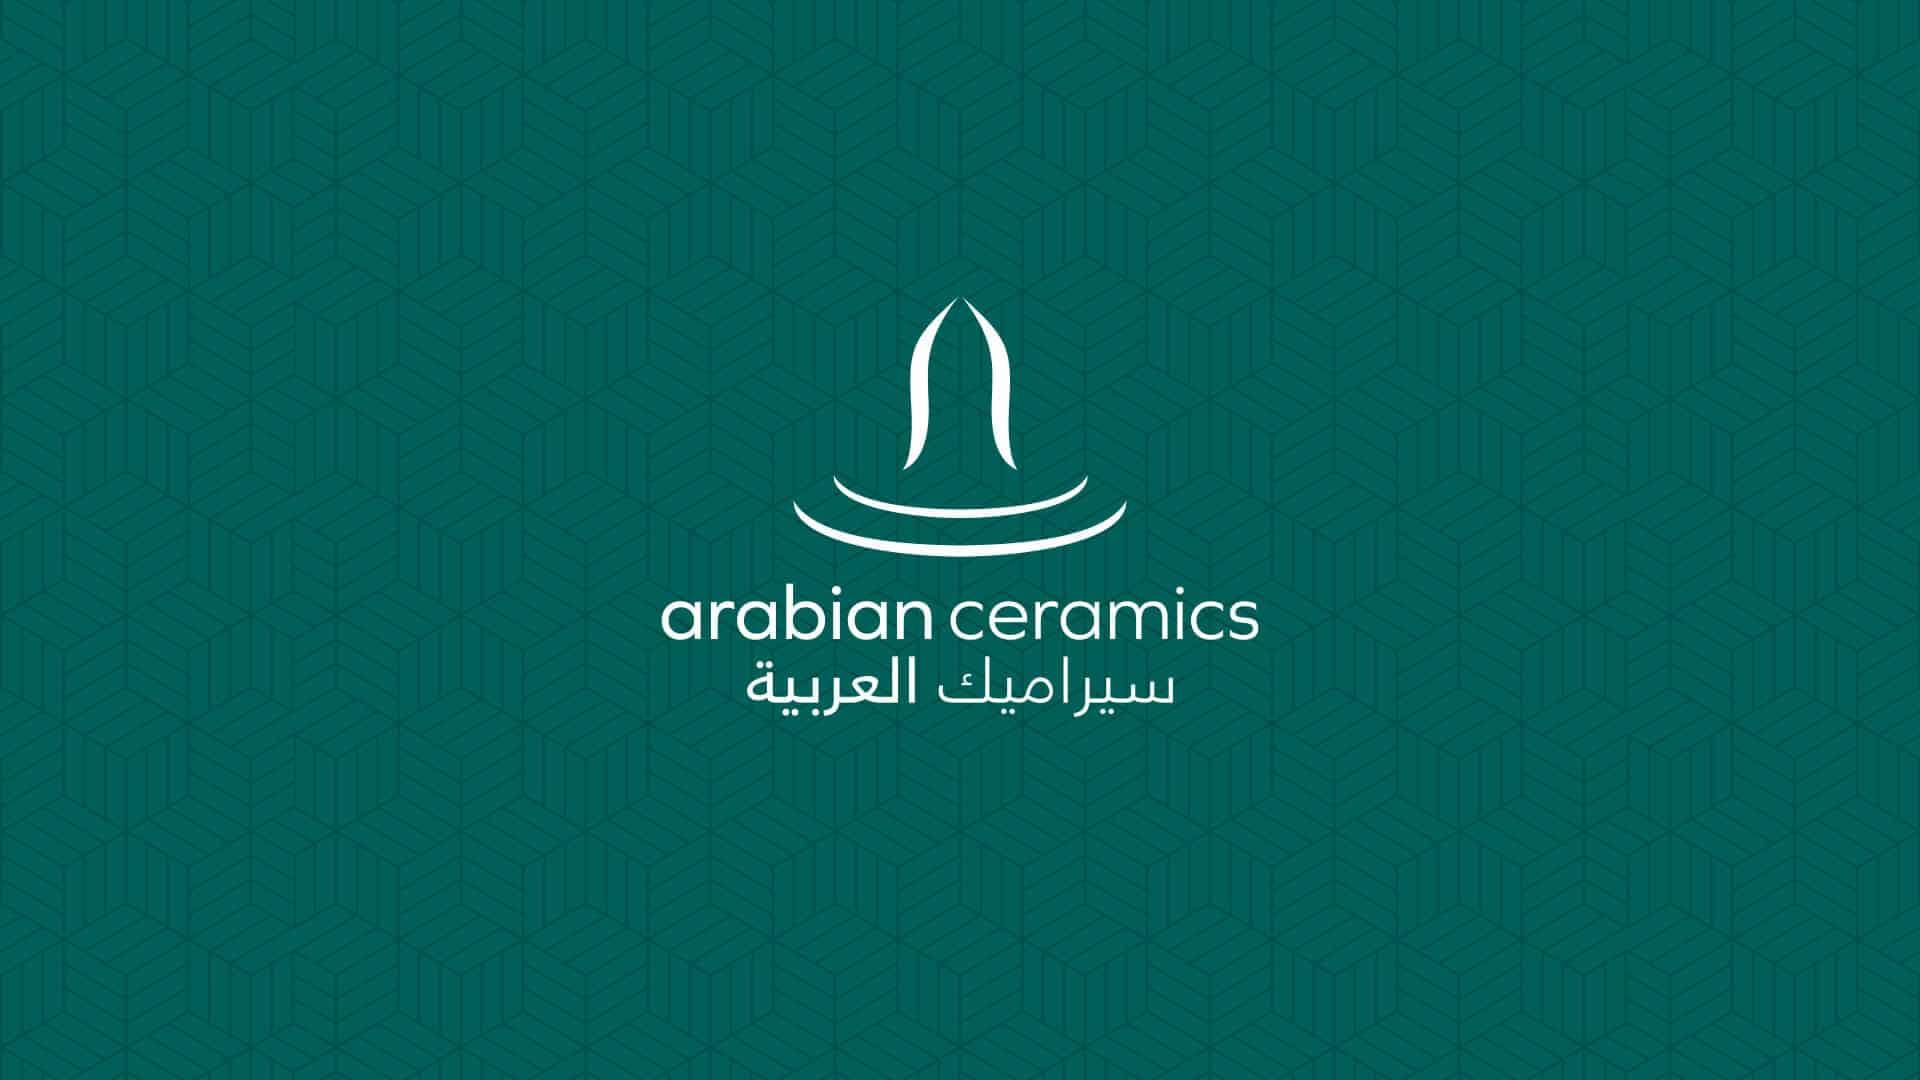 arabian ceramics saudi arabia logo design